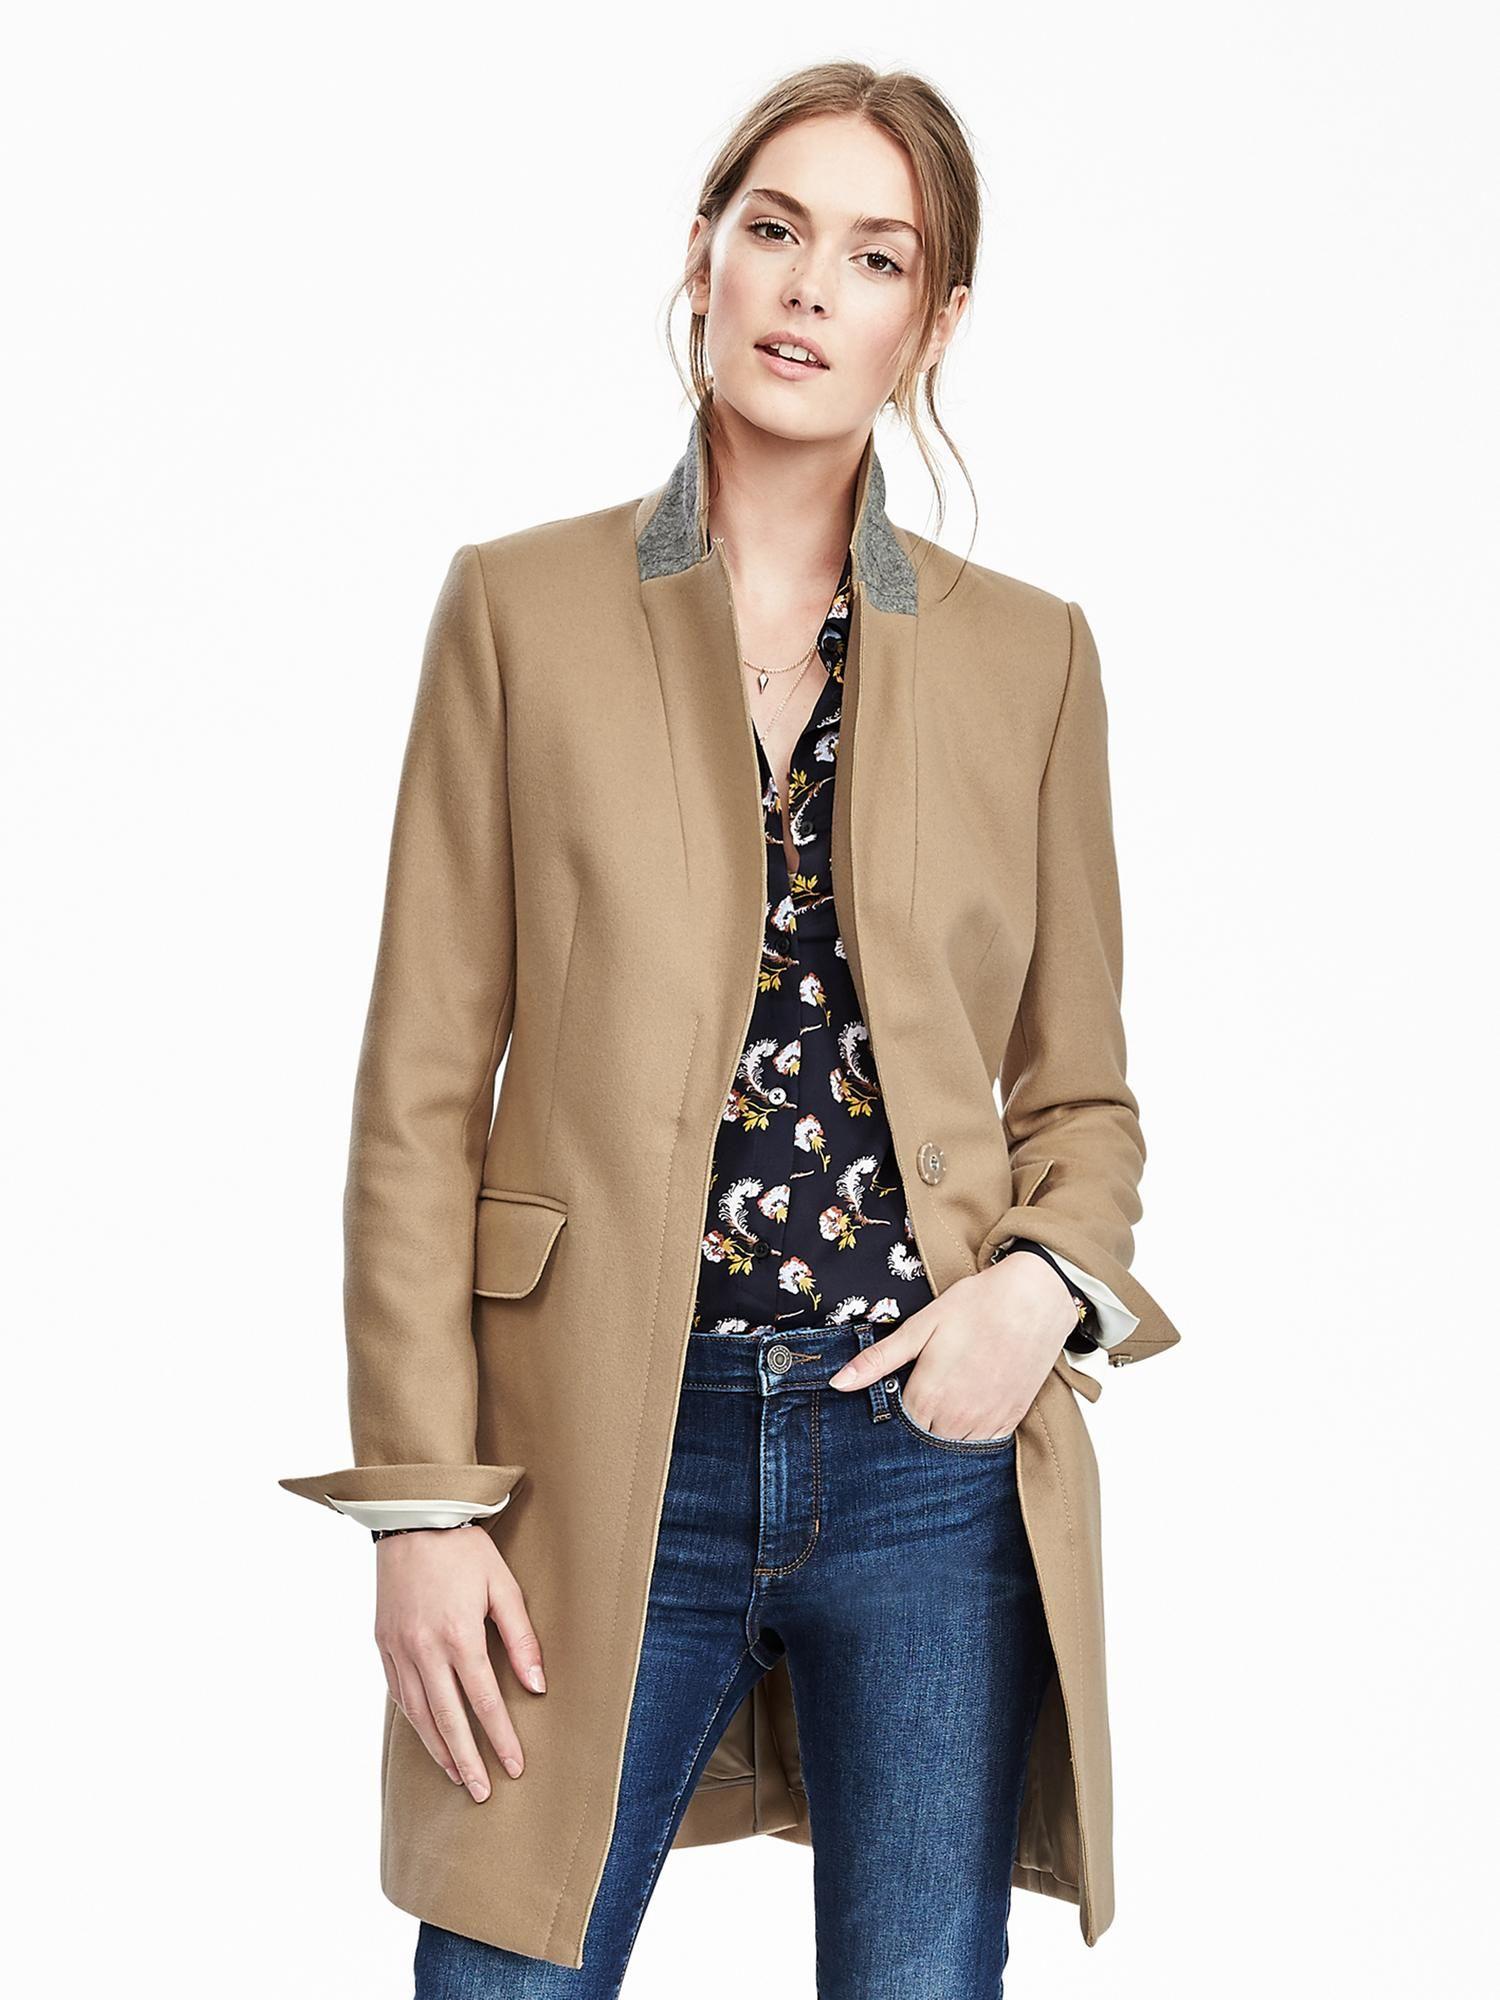 Banana Republic Melton Wool Buttoned Top Coat in Camel